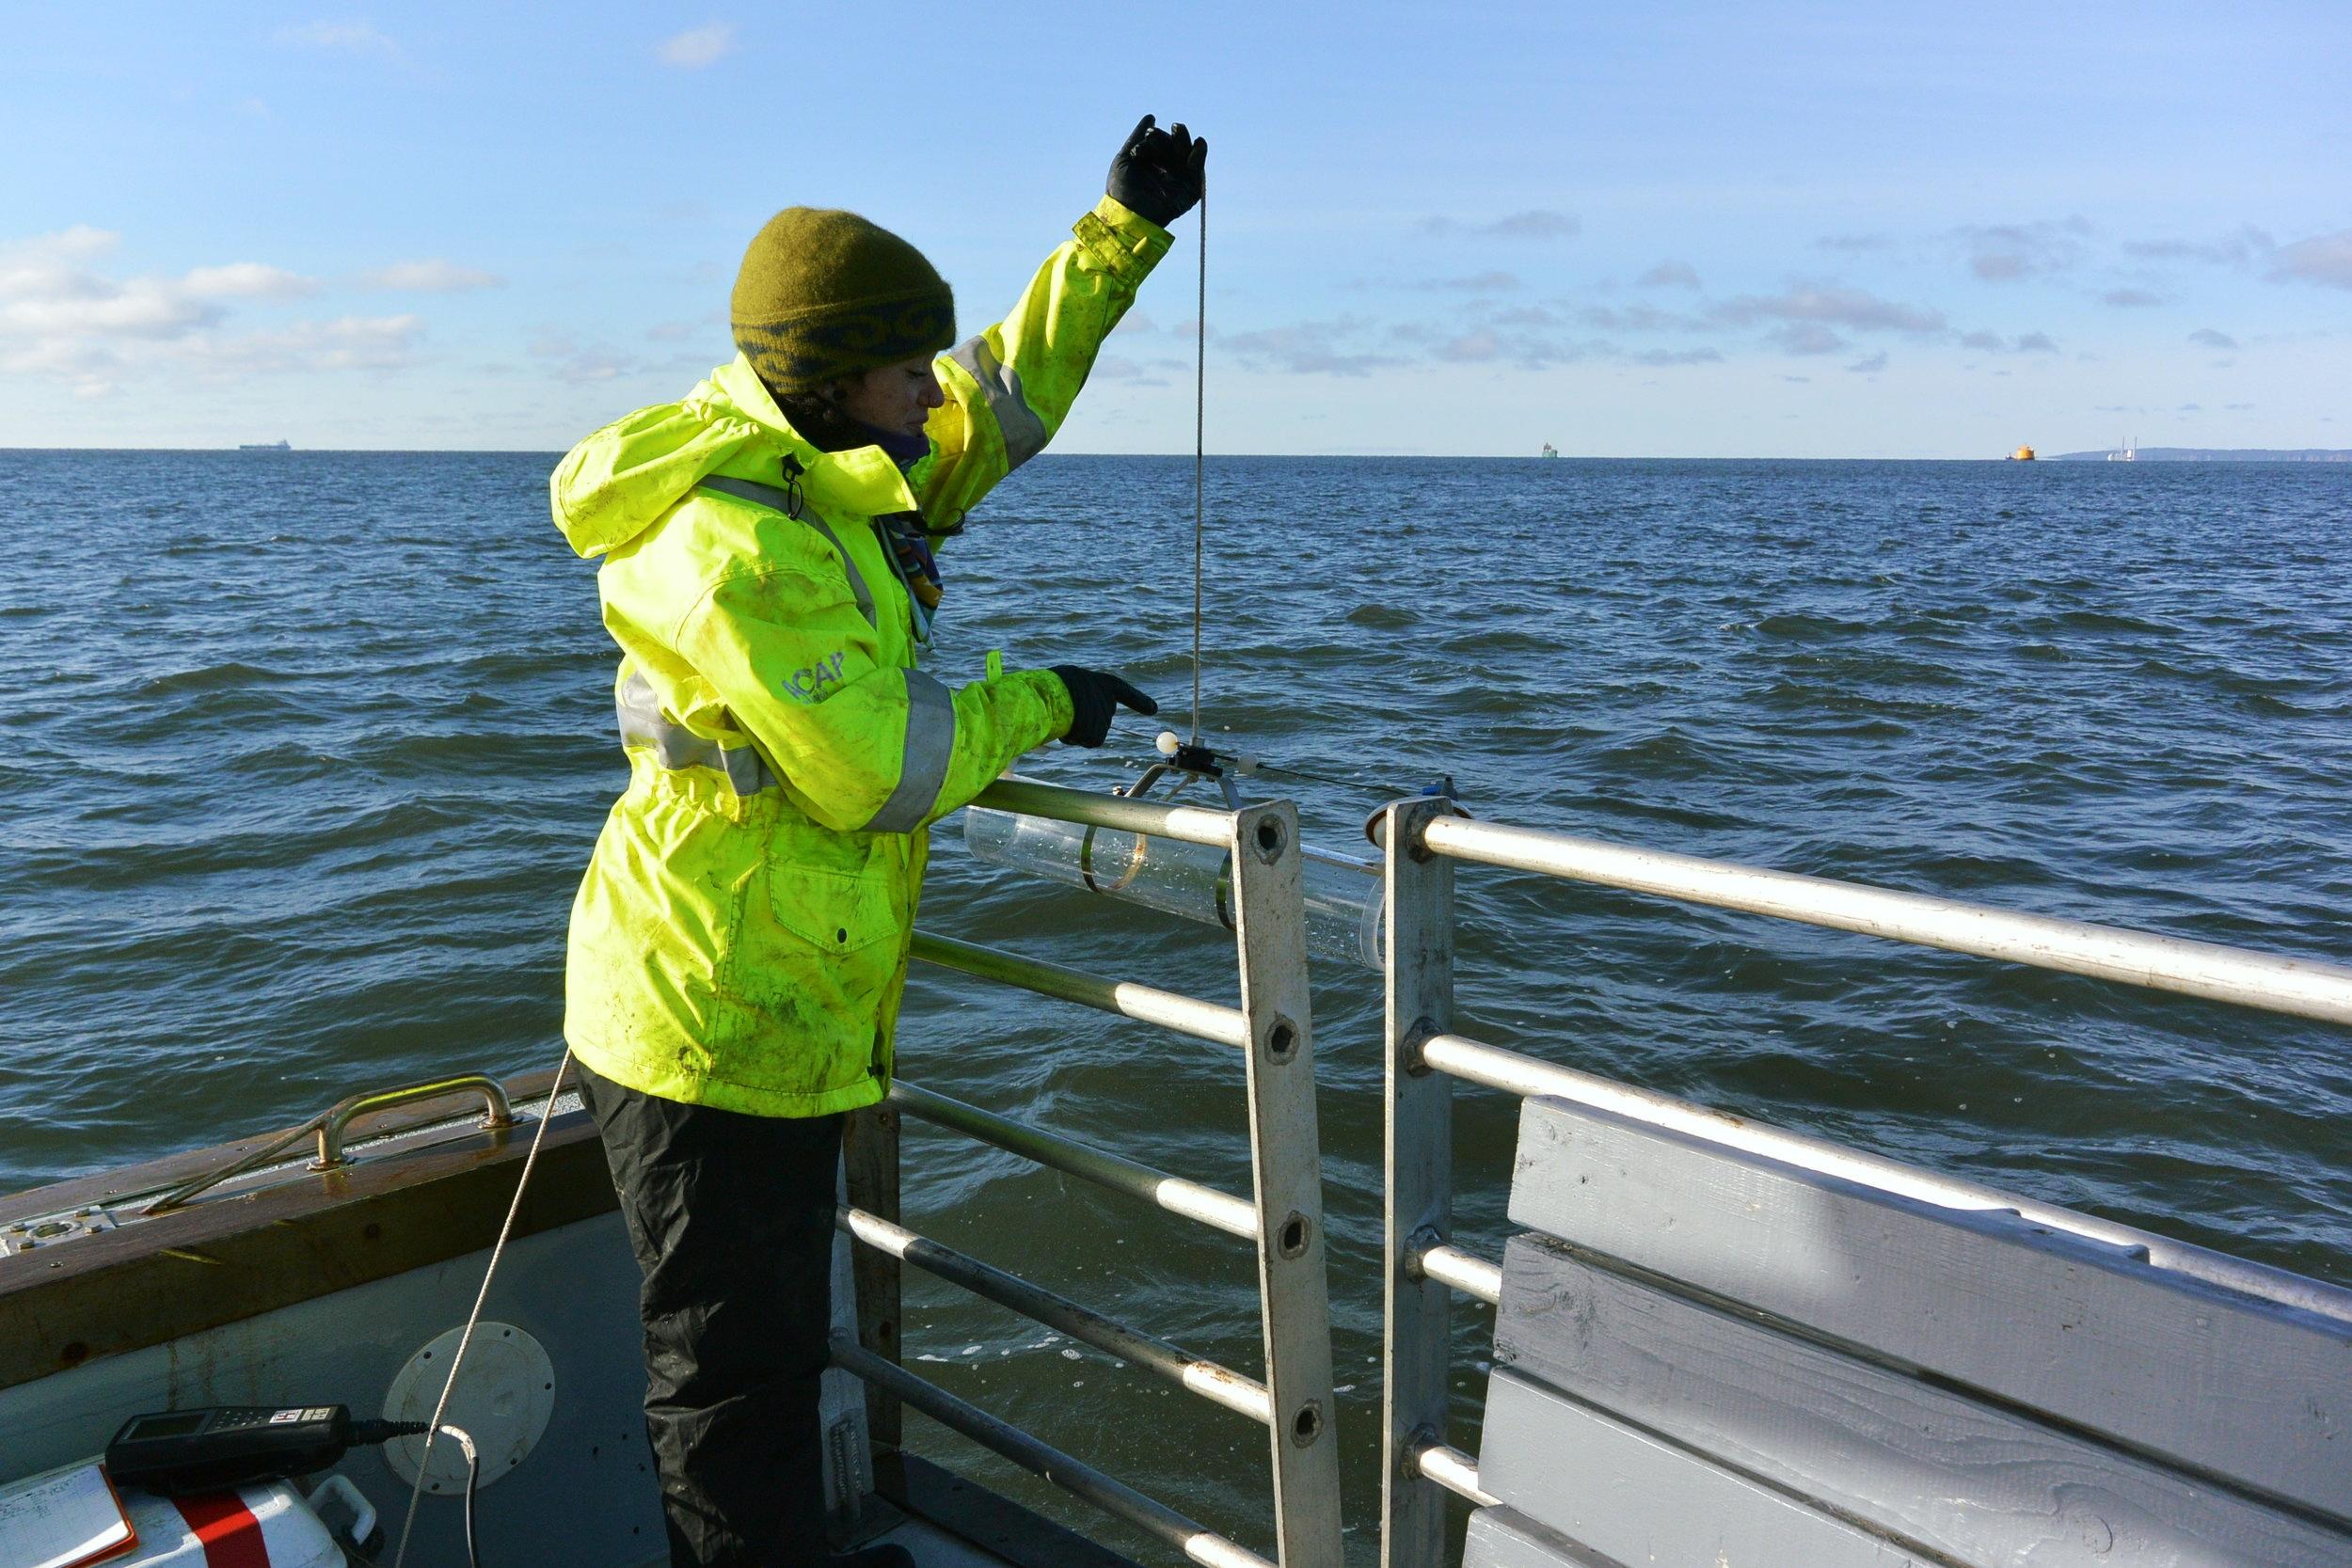 Lowering the Van Dorn water sampler into the water